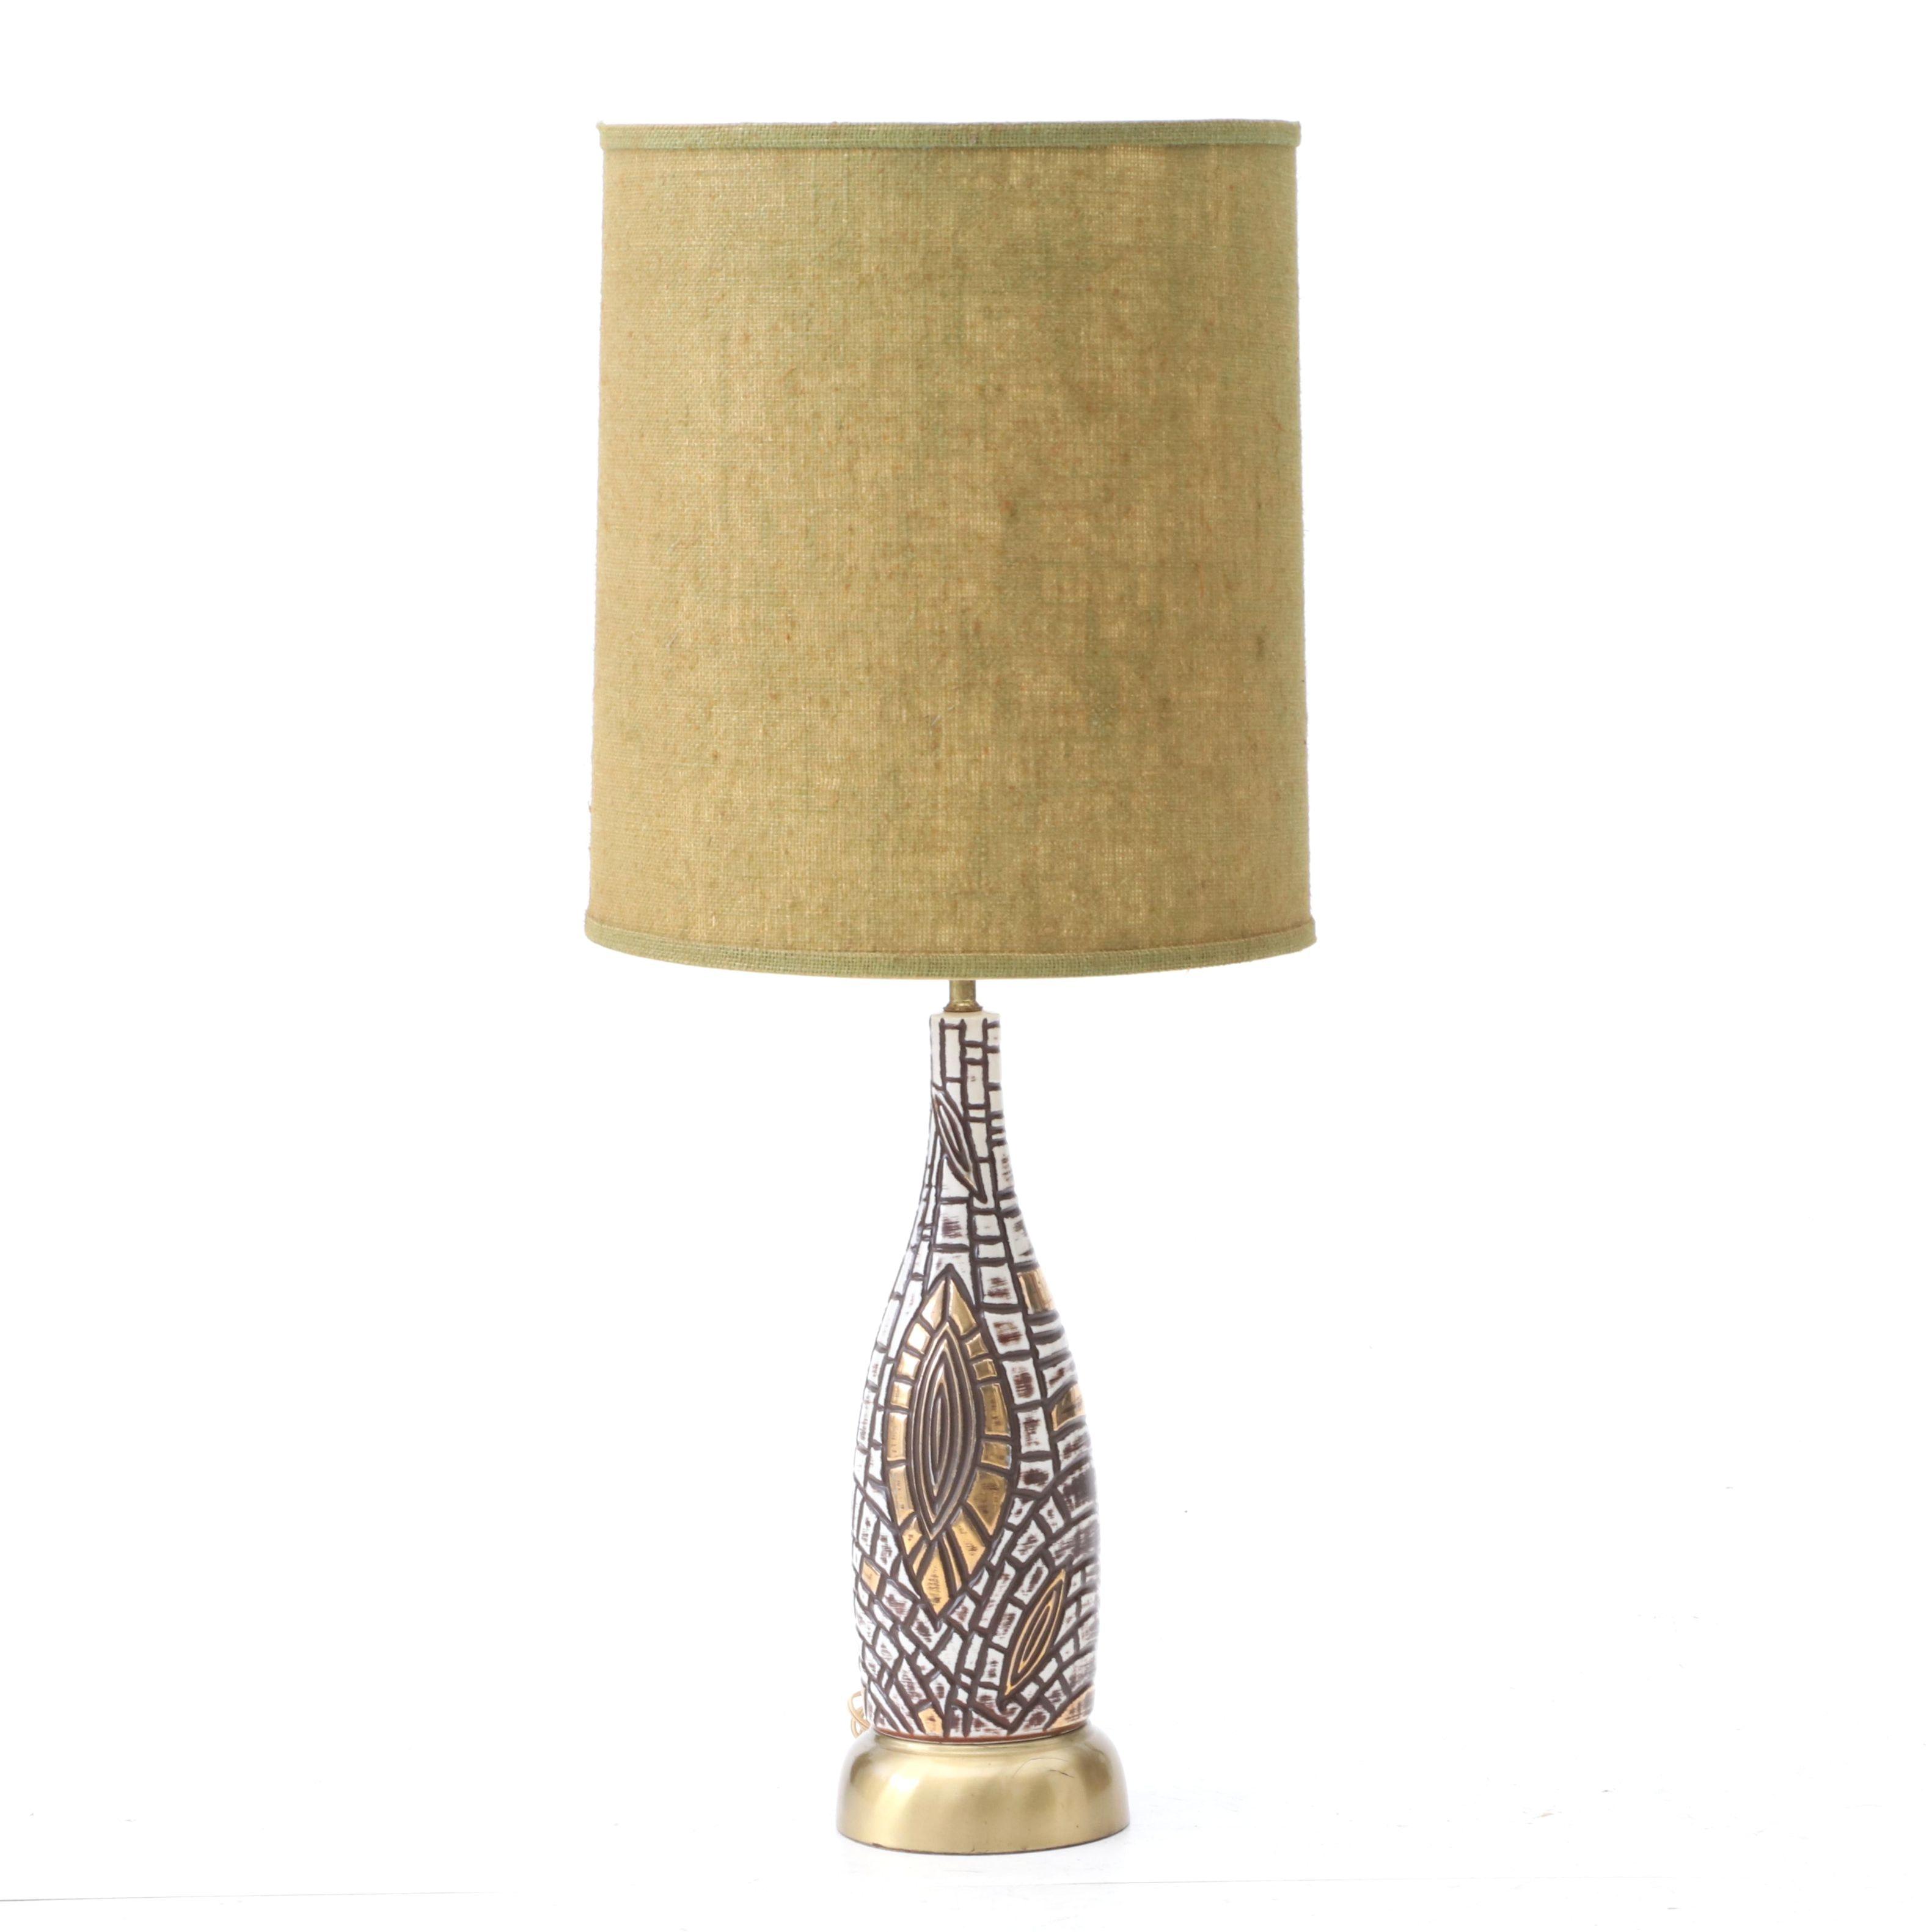 Mid Century Modern Style Ceramic Table Lamp